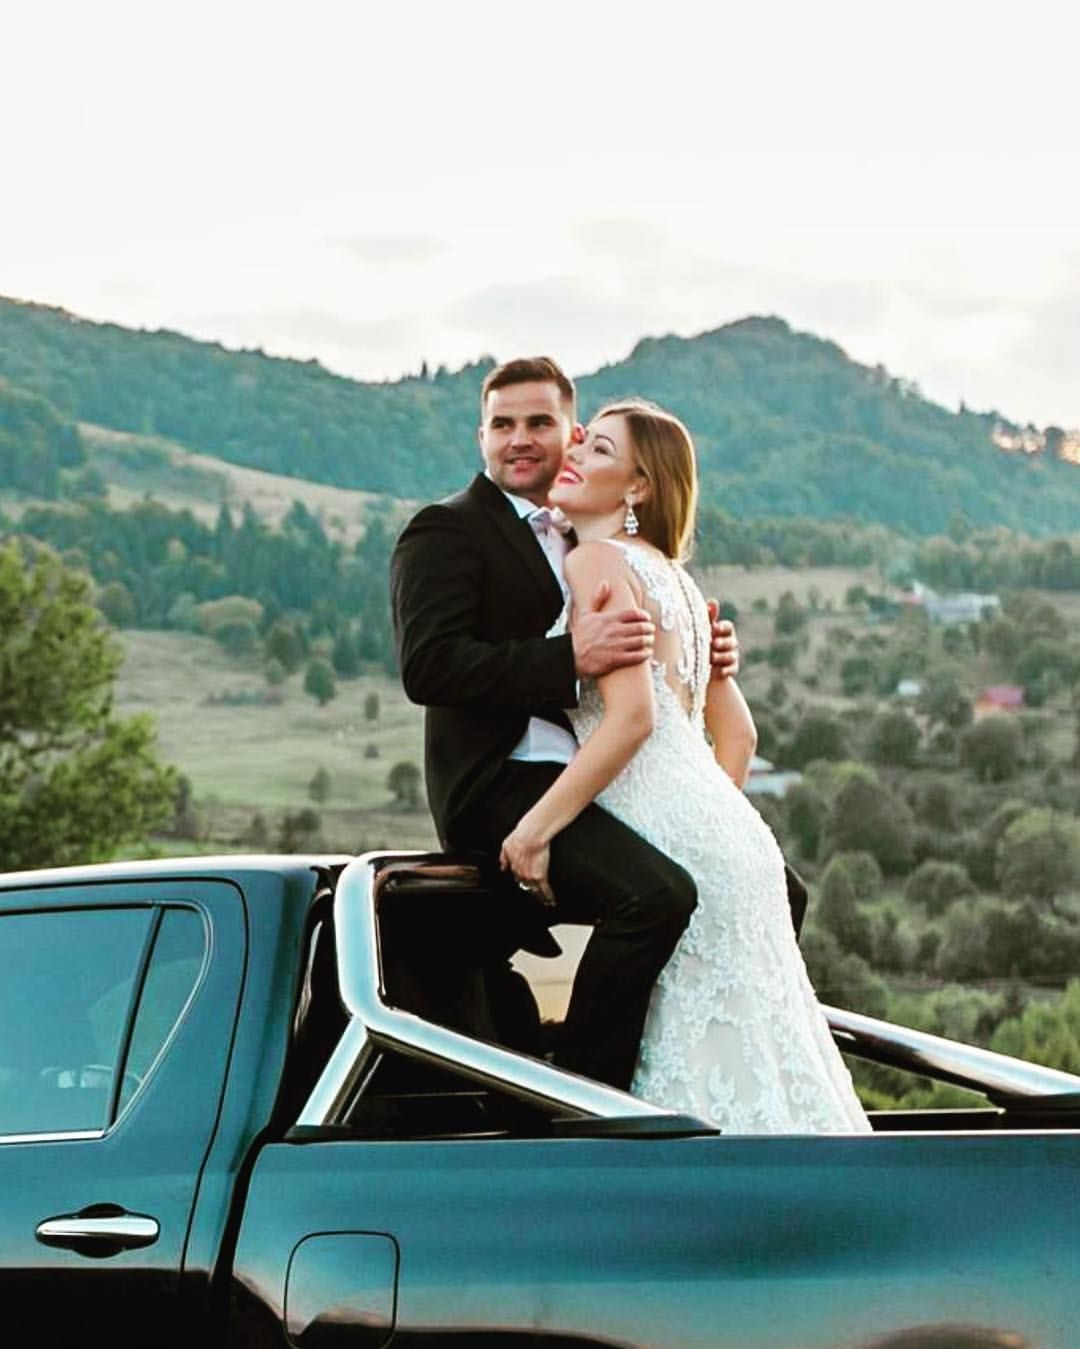 Real Love, Real Bride, #demetriosbride